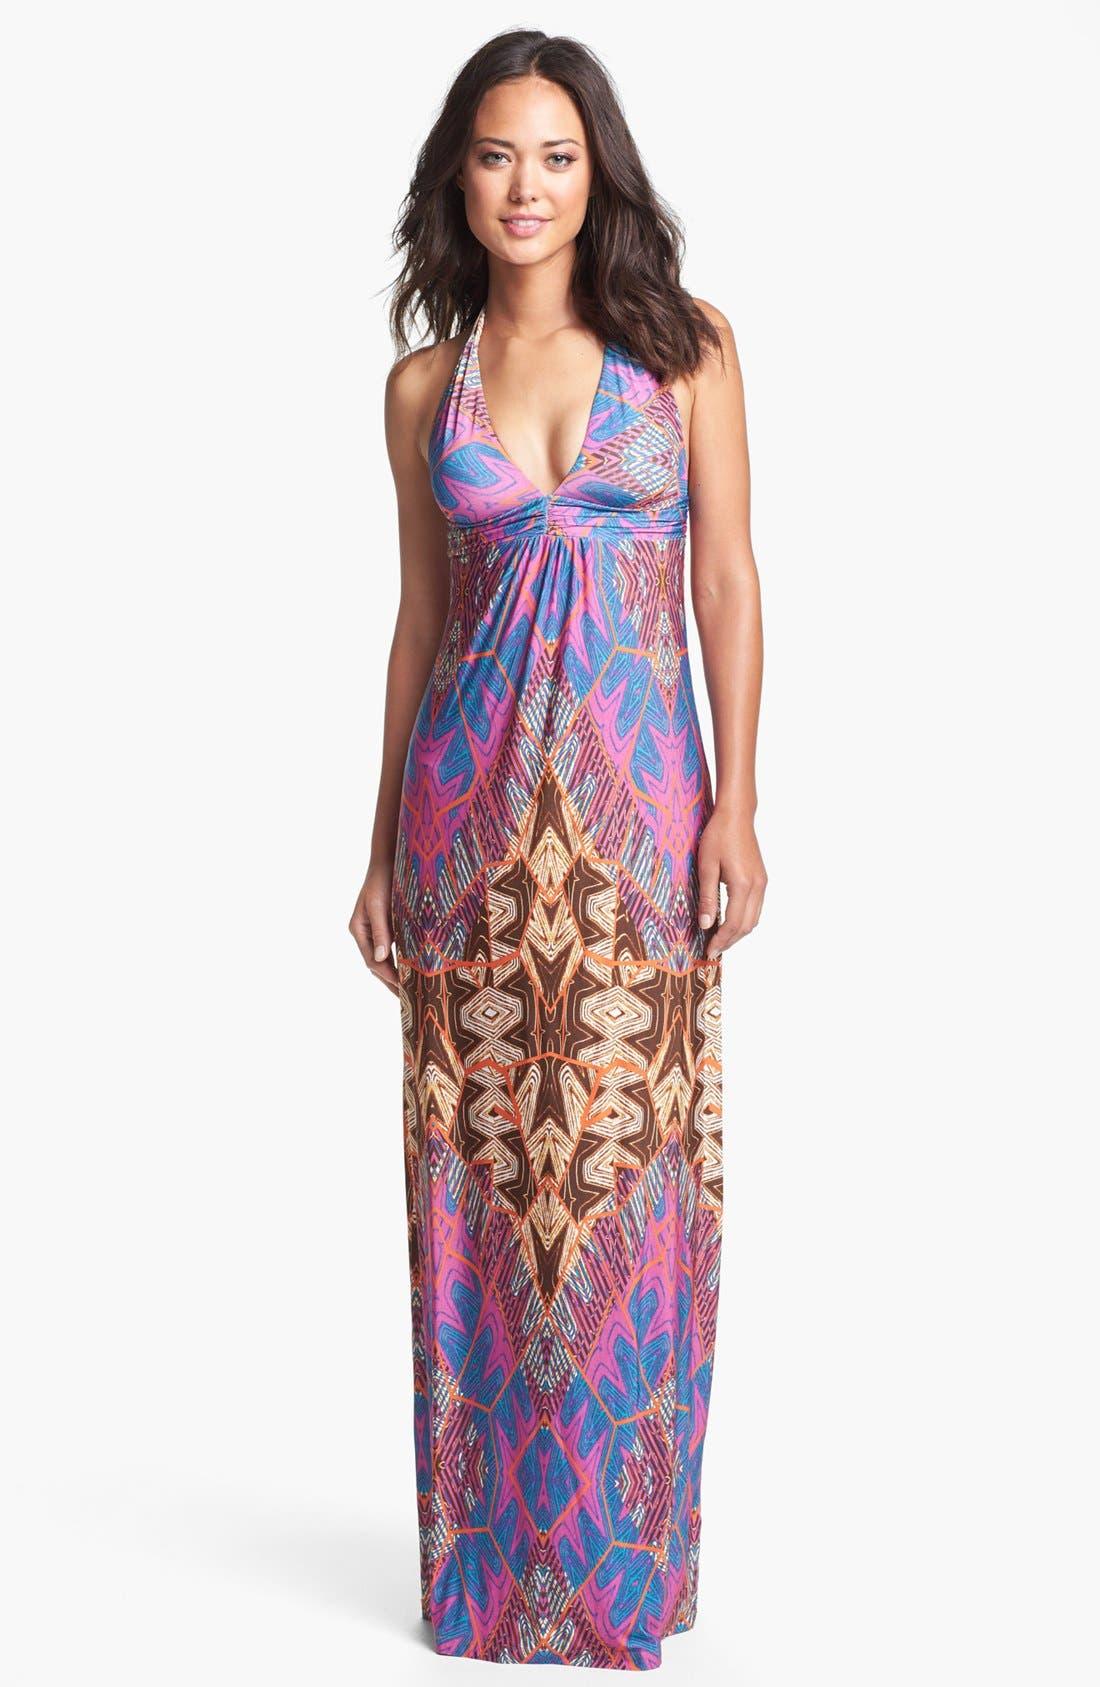 Main Image - ViX Swimwear 'St. Martin' Cover-Up Maxi Dress